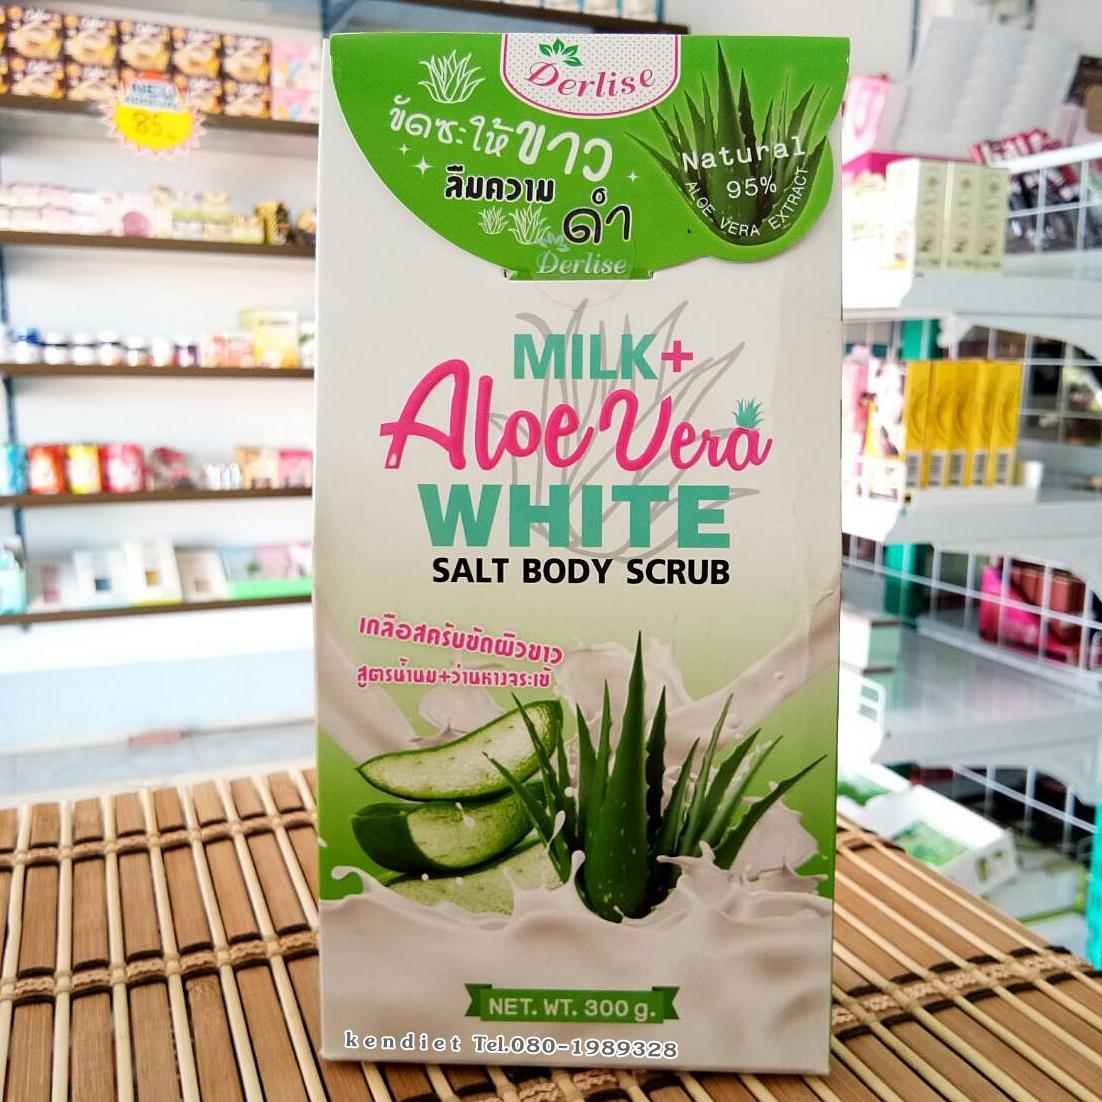 Derlise Milk Aloe Vera White salt Body scrub เกลือสครับขัดผิวขาว สูตรน้ำนม+ว่านหางจระเข้